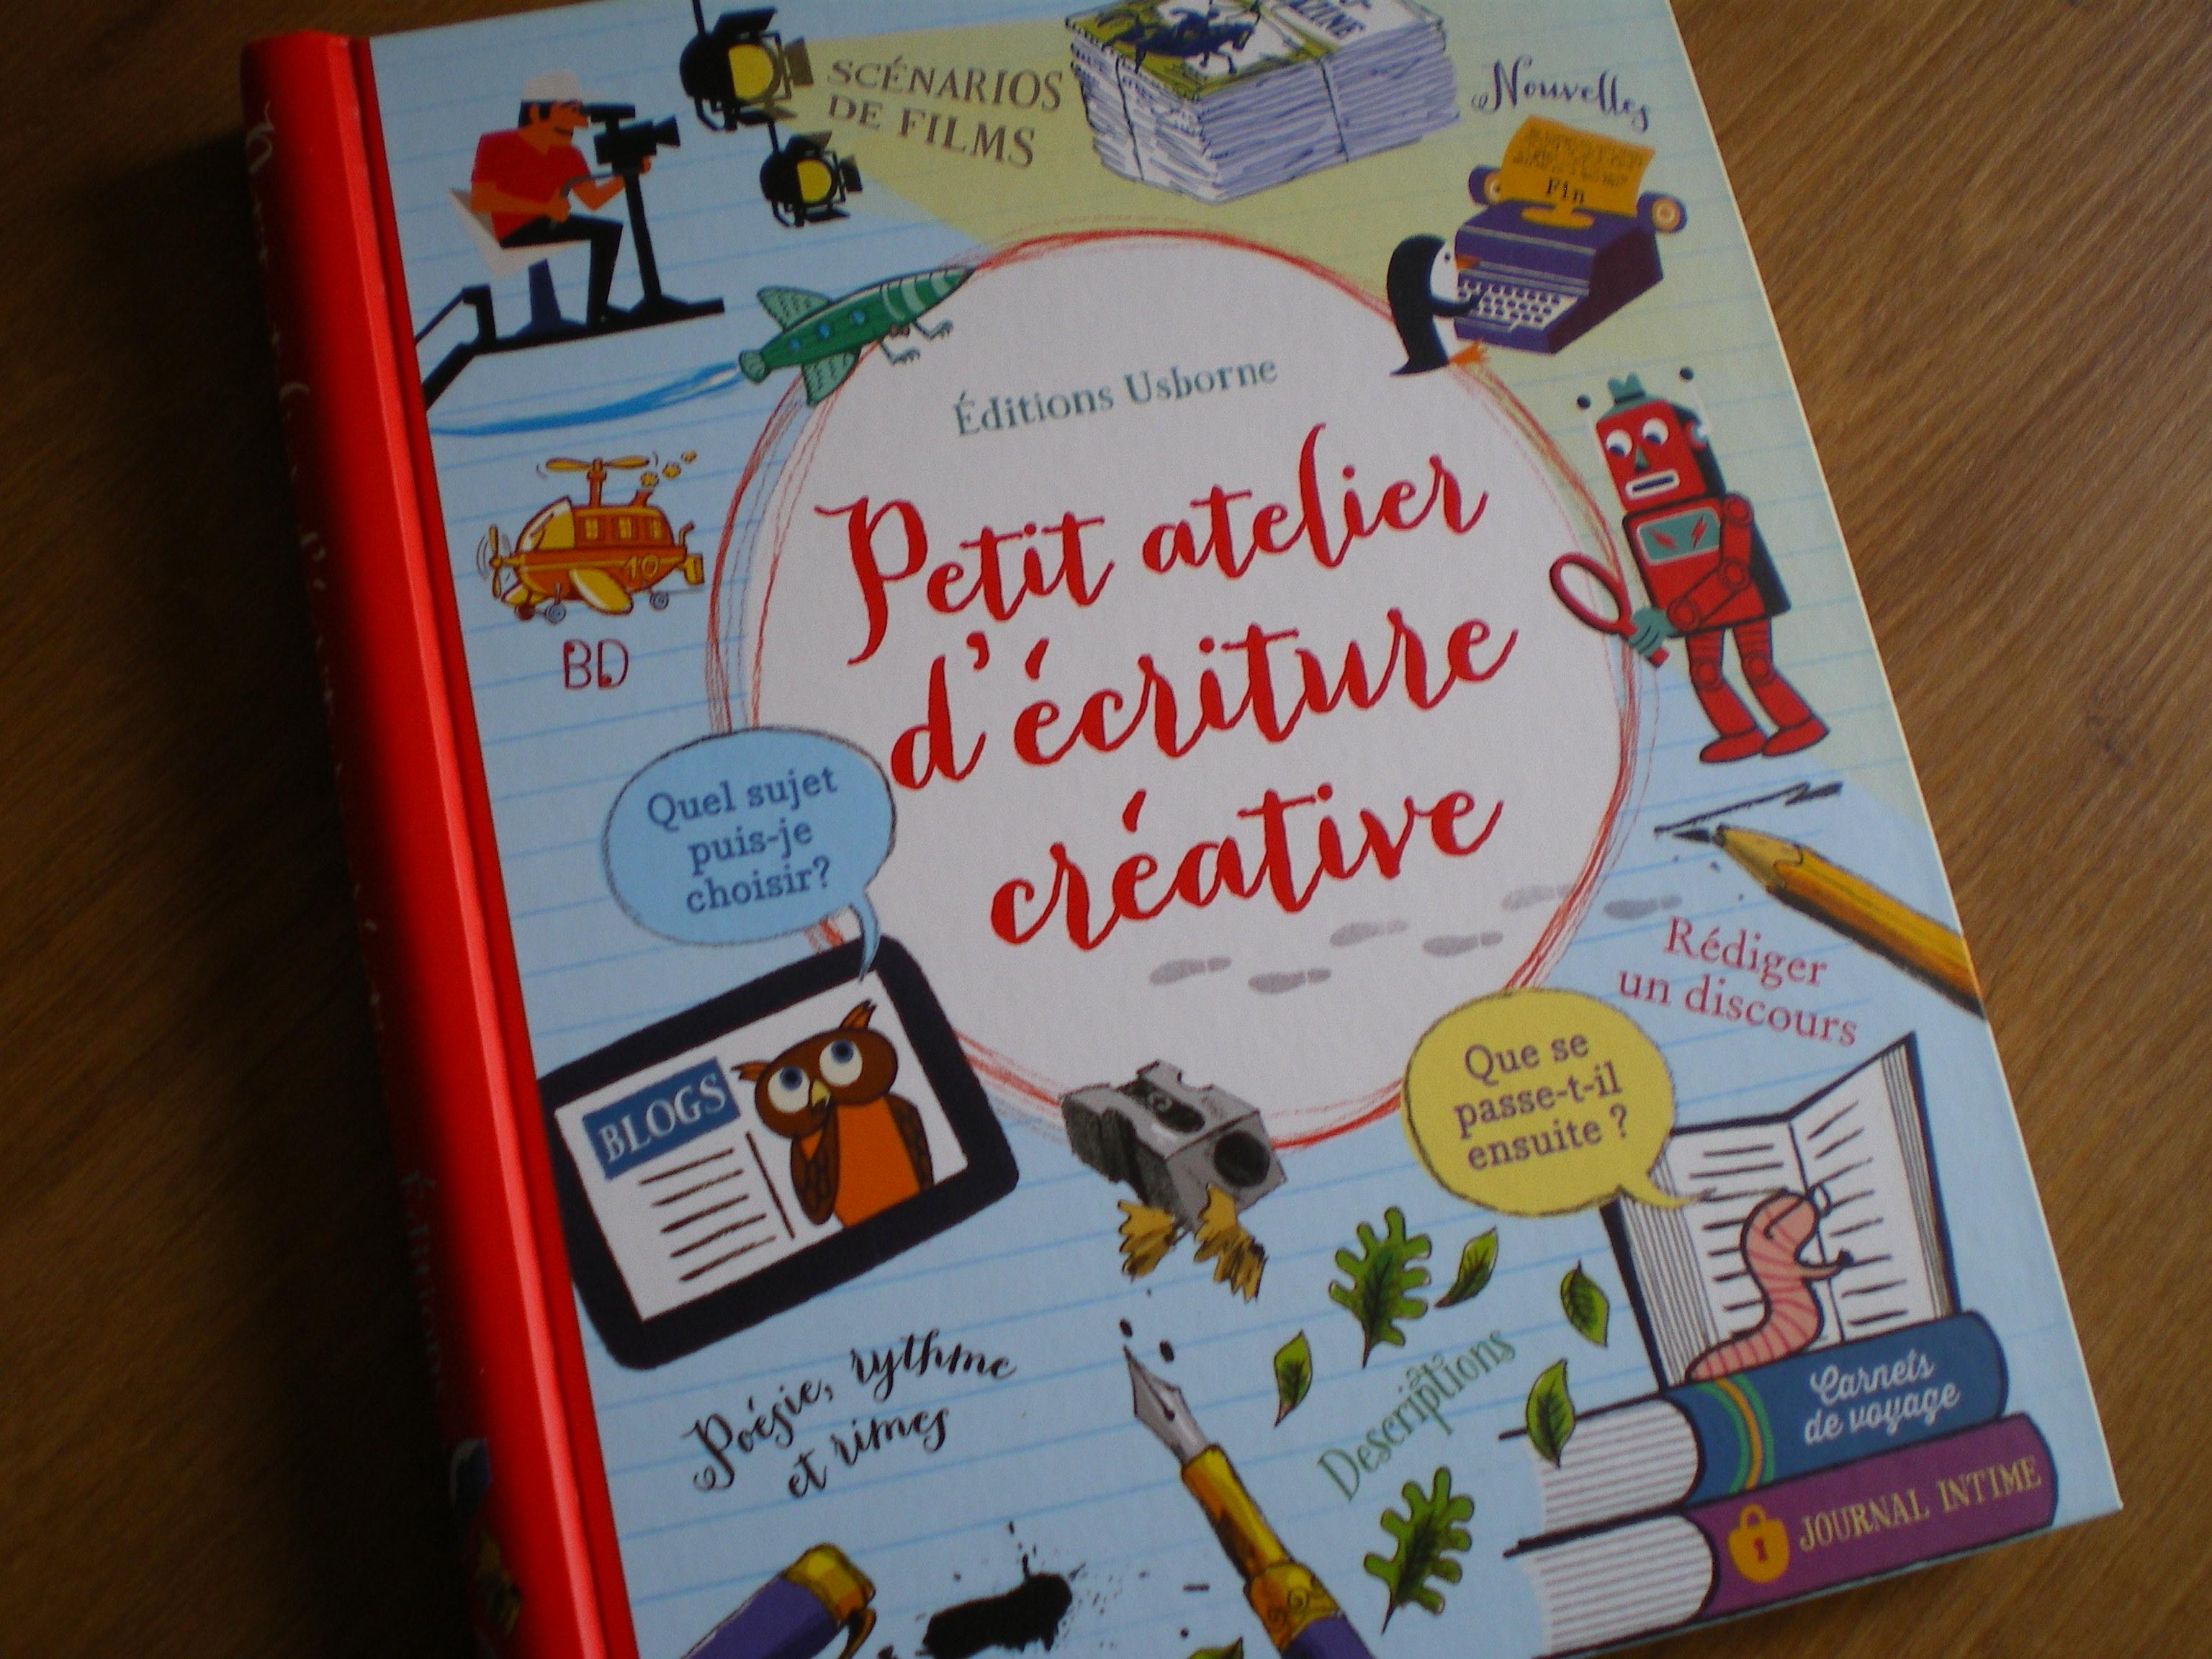 Petit Atelier D Ecriture Creative Conseils Idees Et